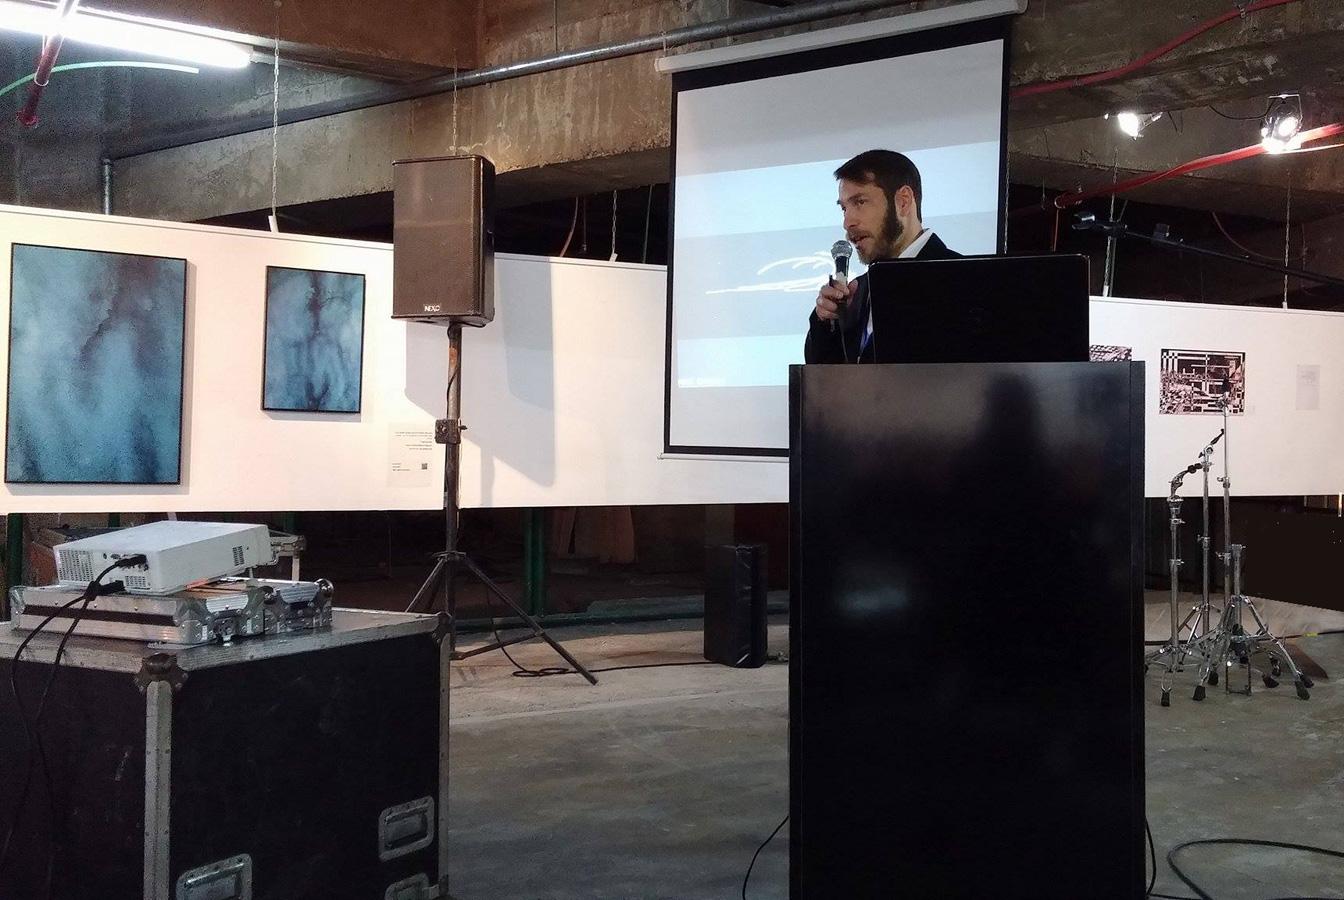 Nir-Sivan-Architects-Israel-Planning-Association-1-בכנס-השנתי-של-איגוד-המתכננים